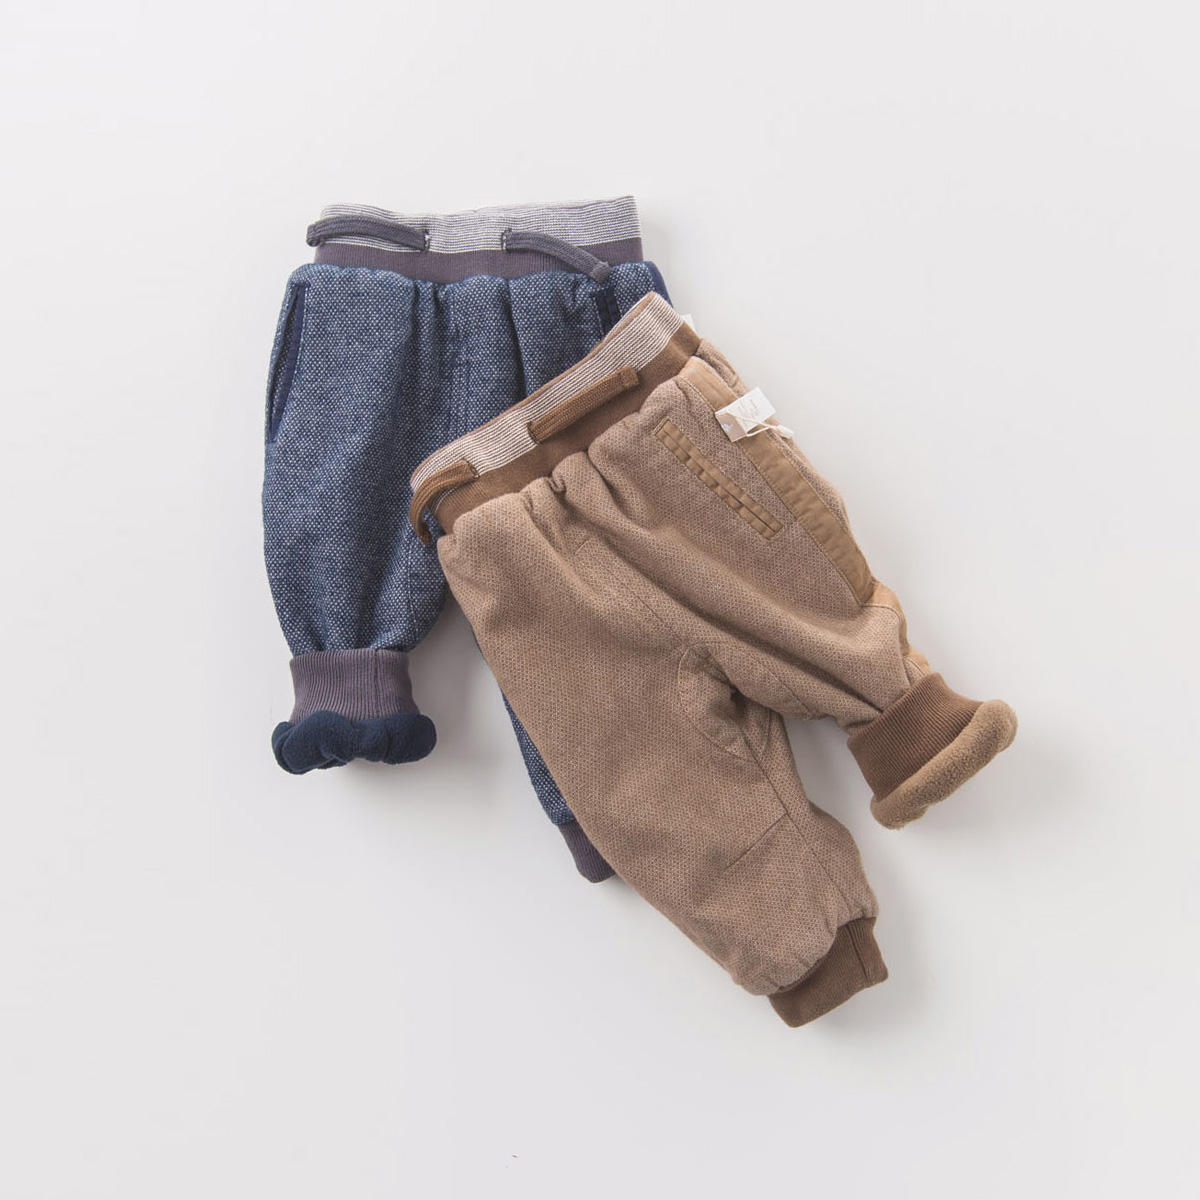 davebella戴维贝拉秋冬季儿童裤子 男童休闲长裤DB6164